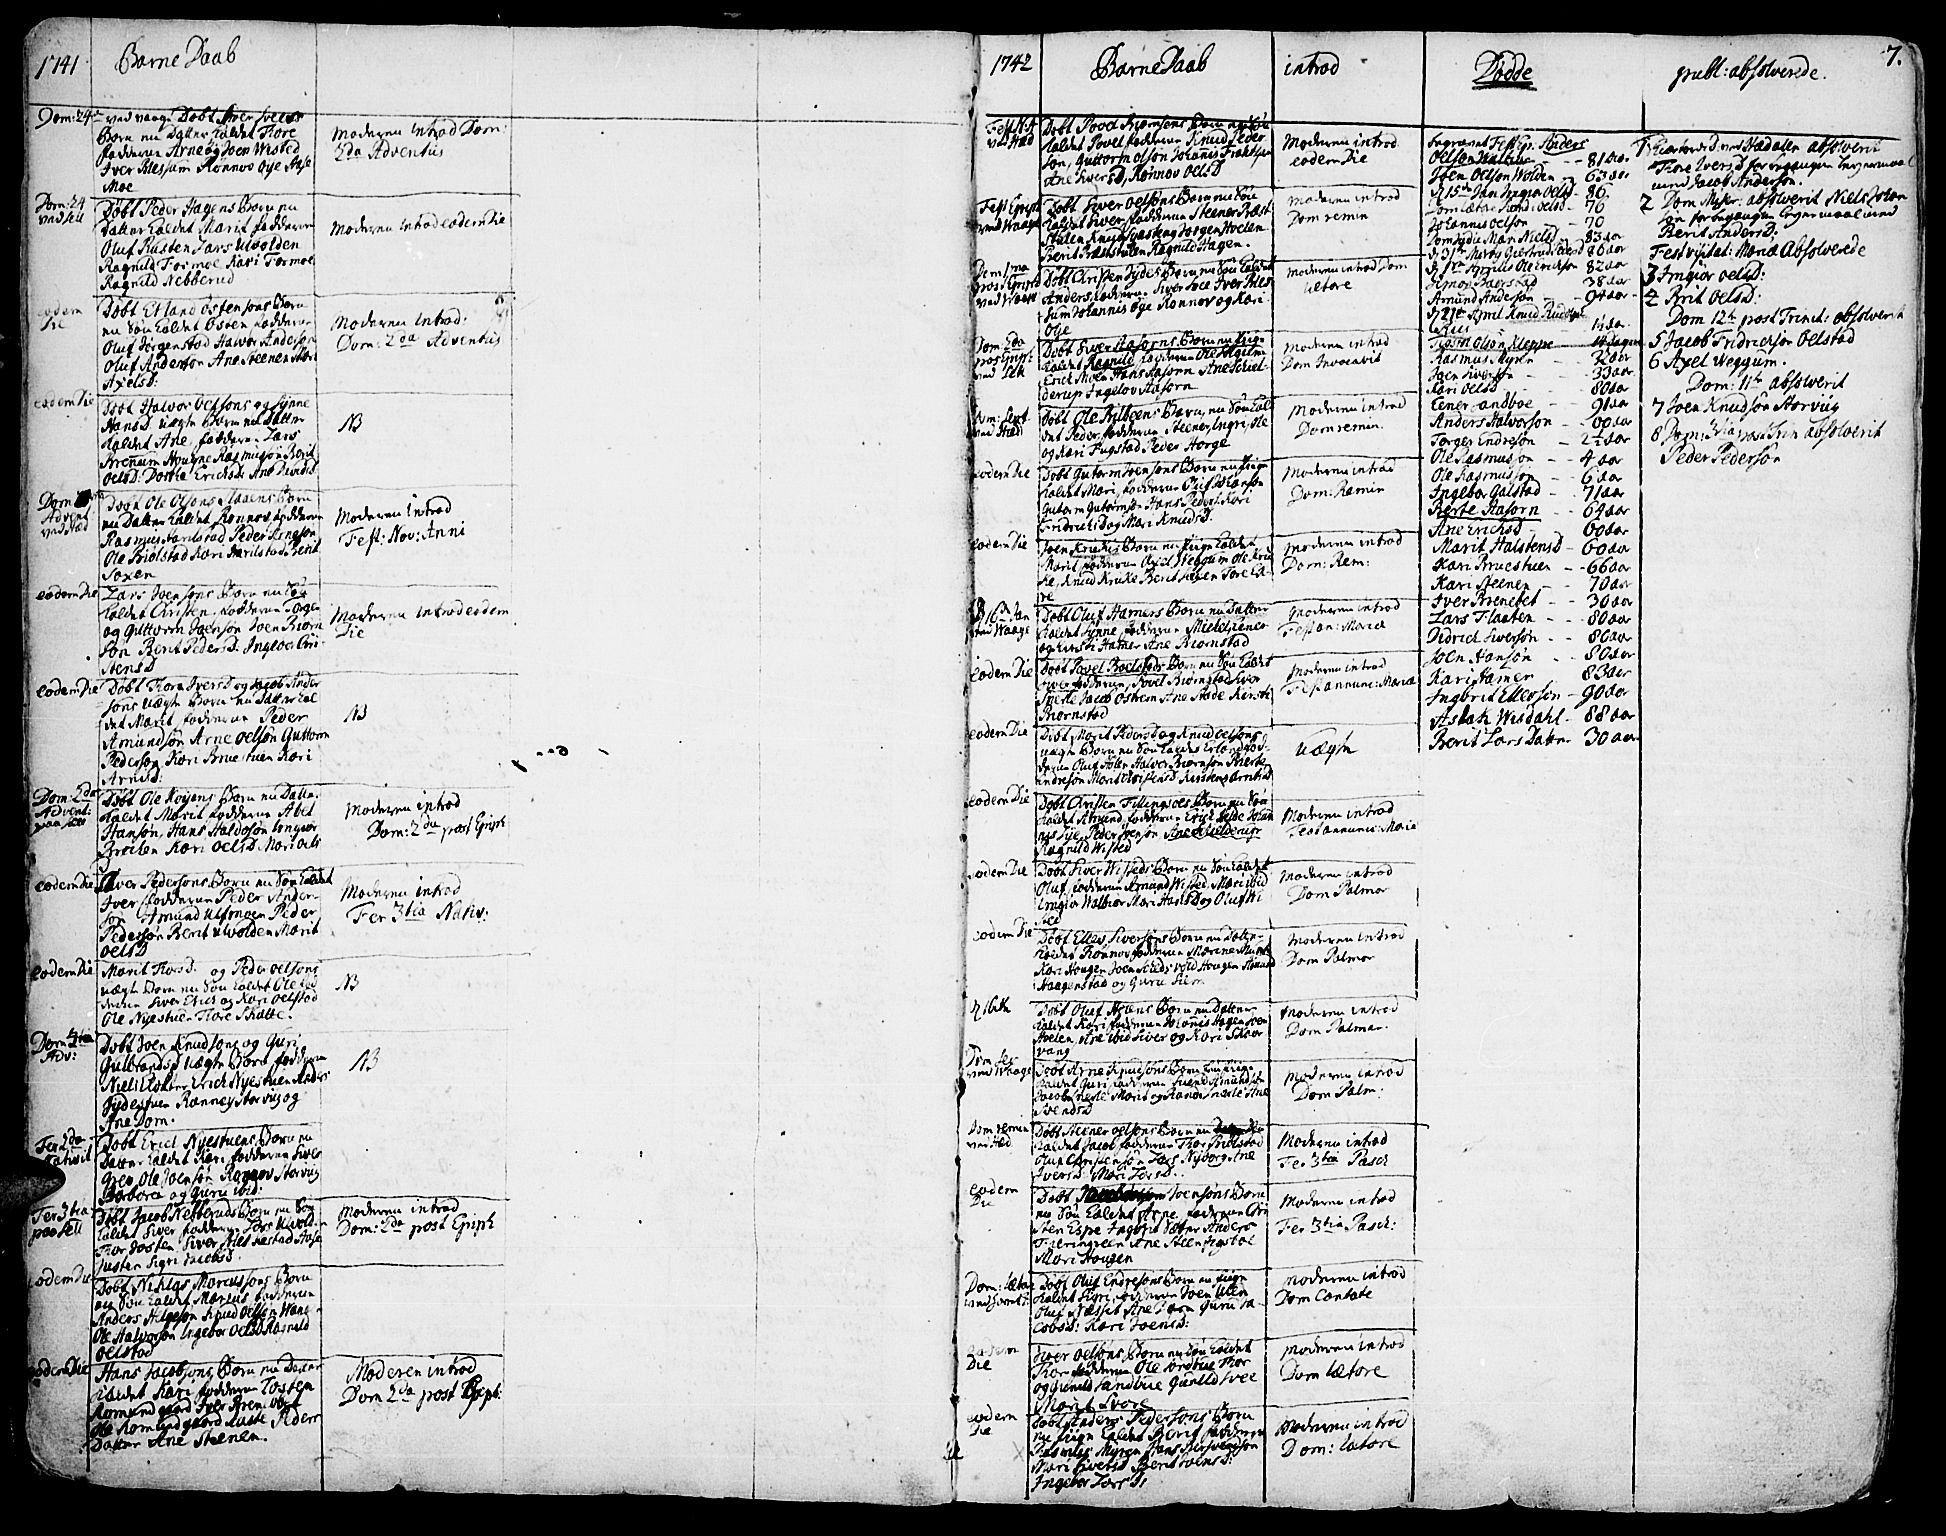 SAH, Vågå prestekontor, Ministerialbok nr. 1, 1739-1810, s. 7